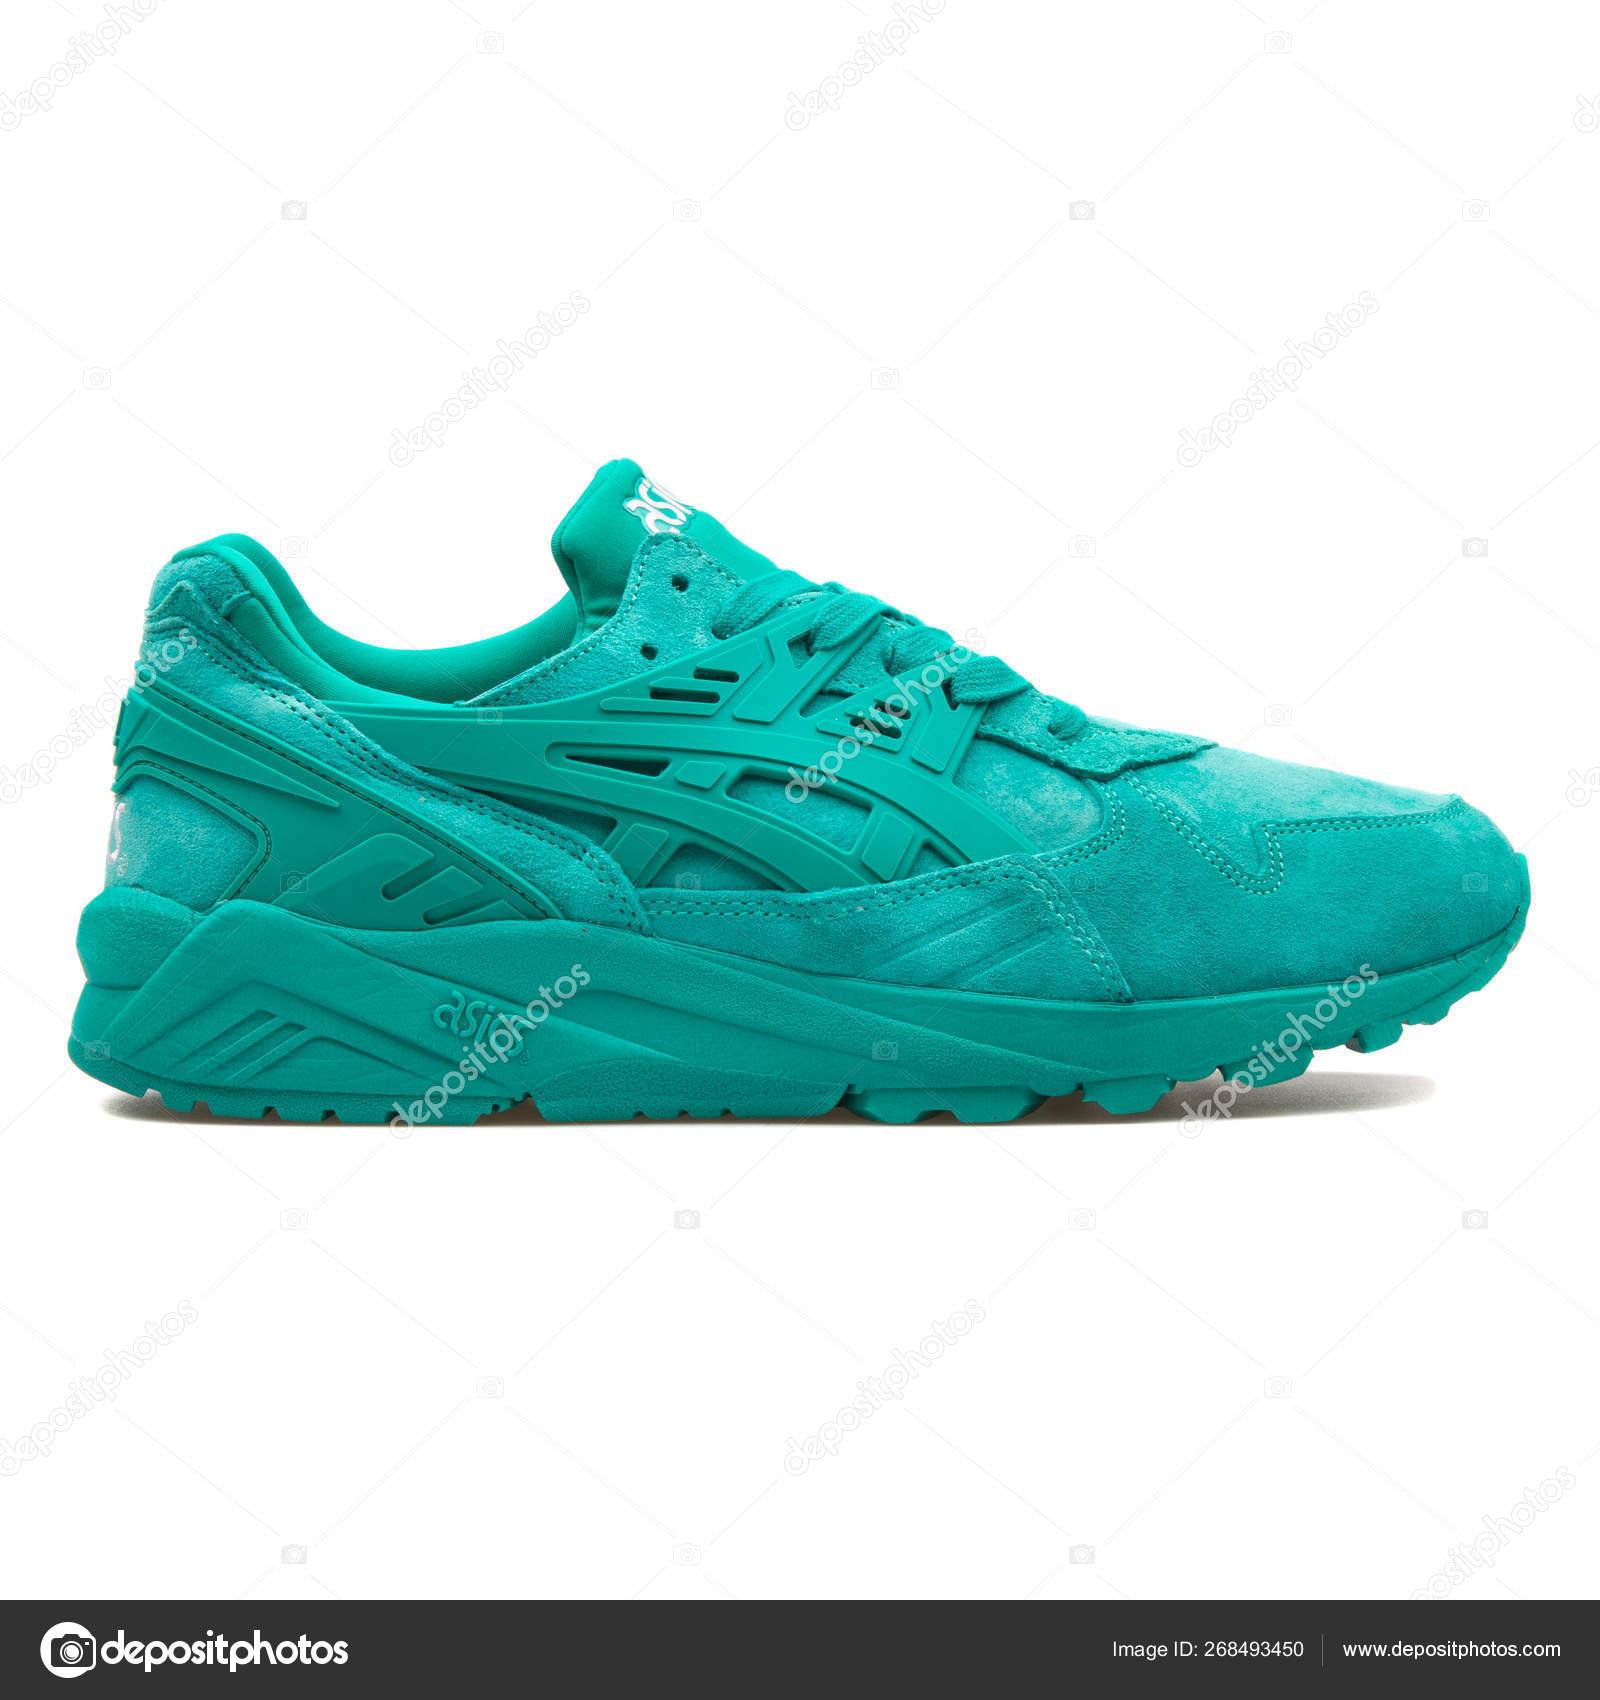 Asics Gel Kayano Trainer green sneaker